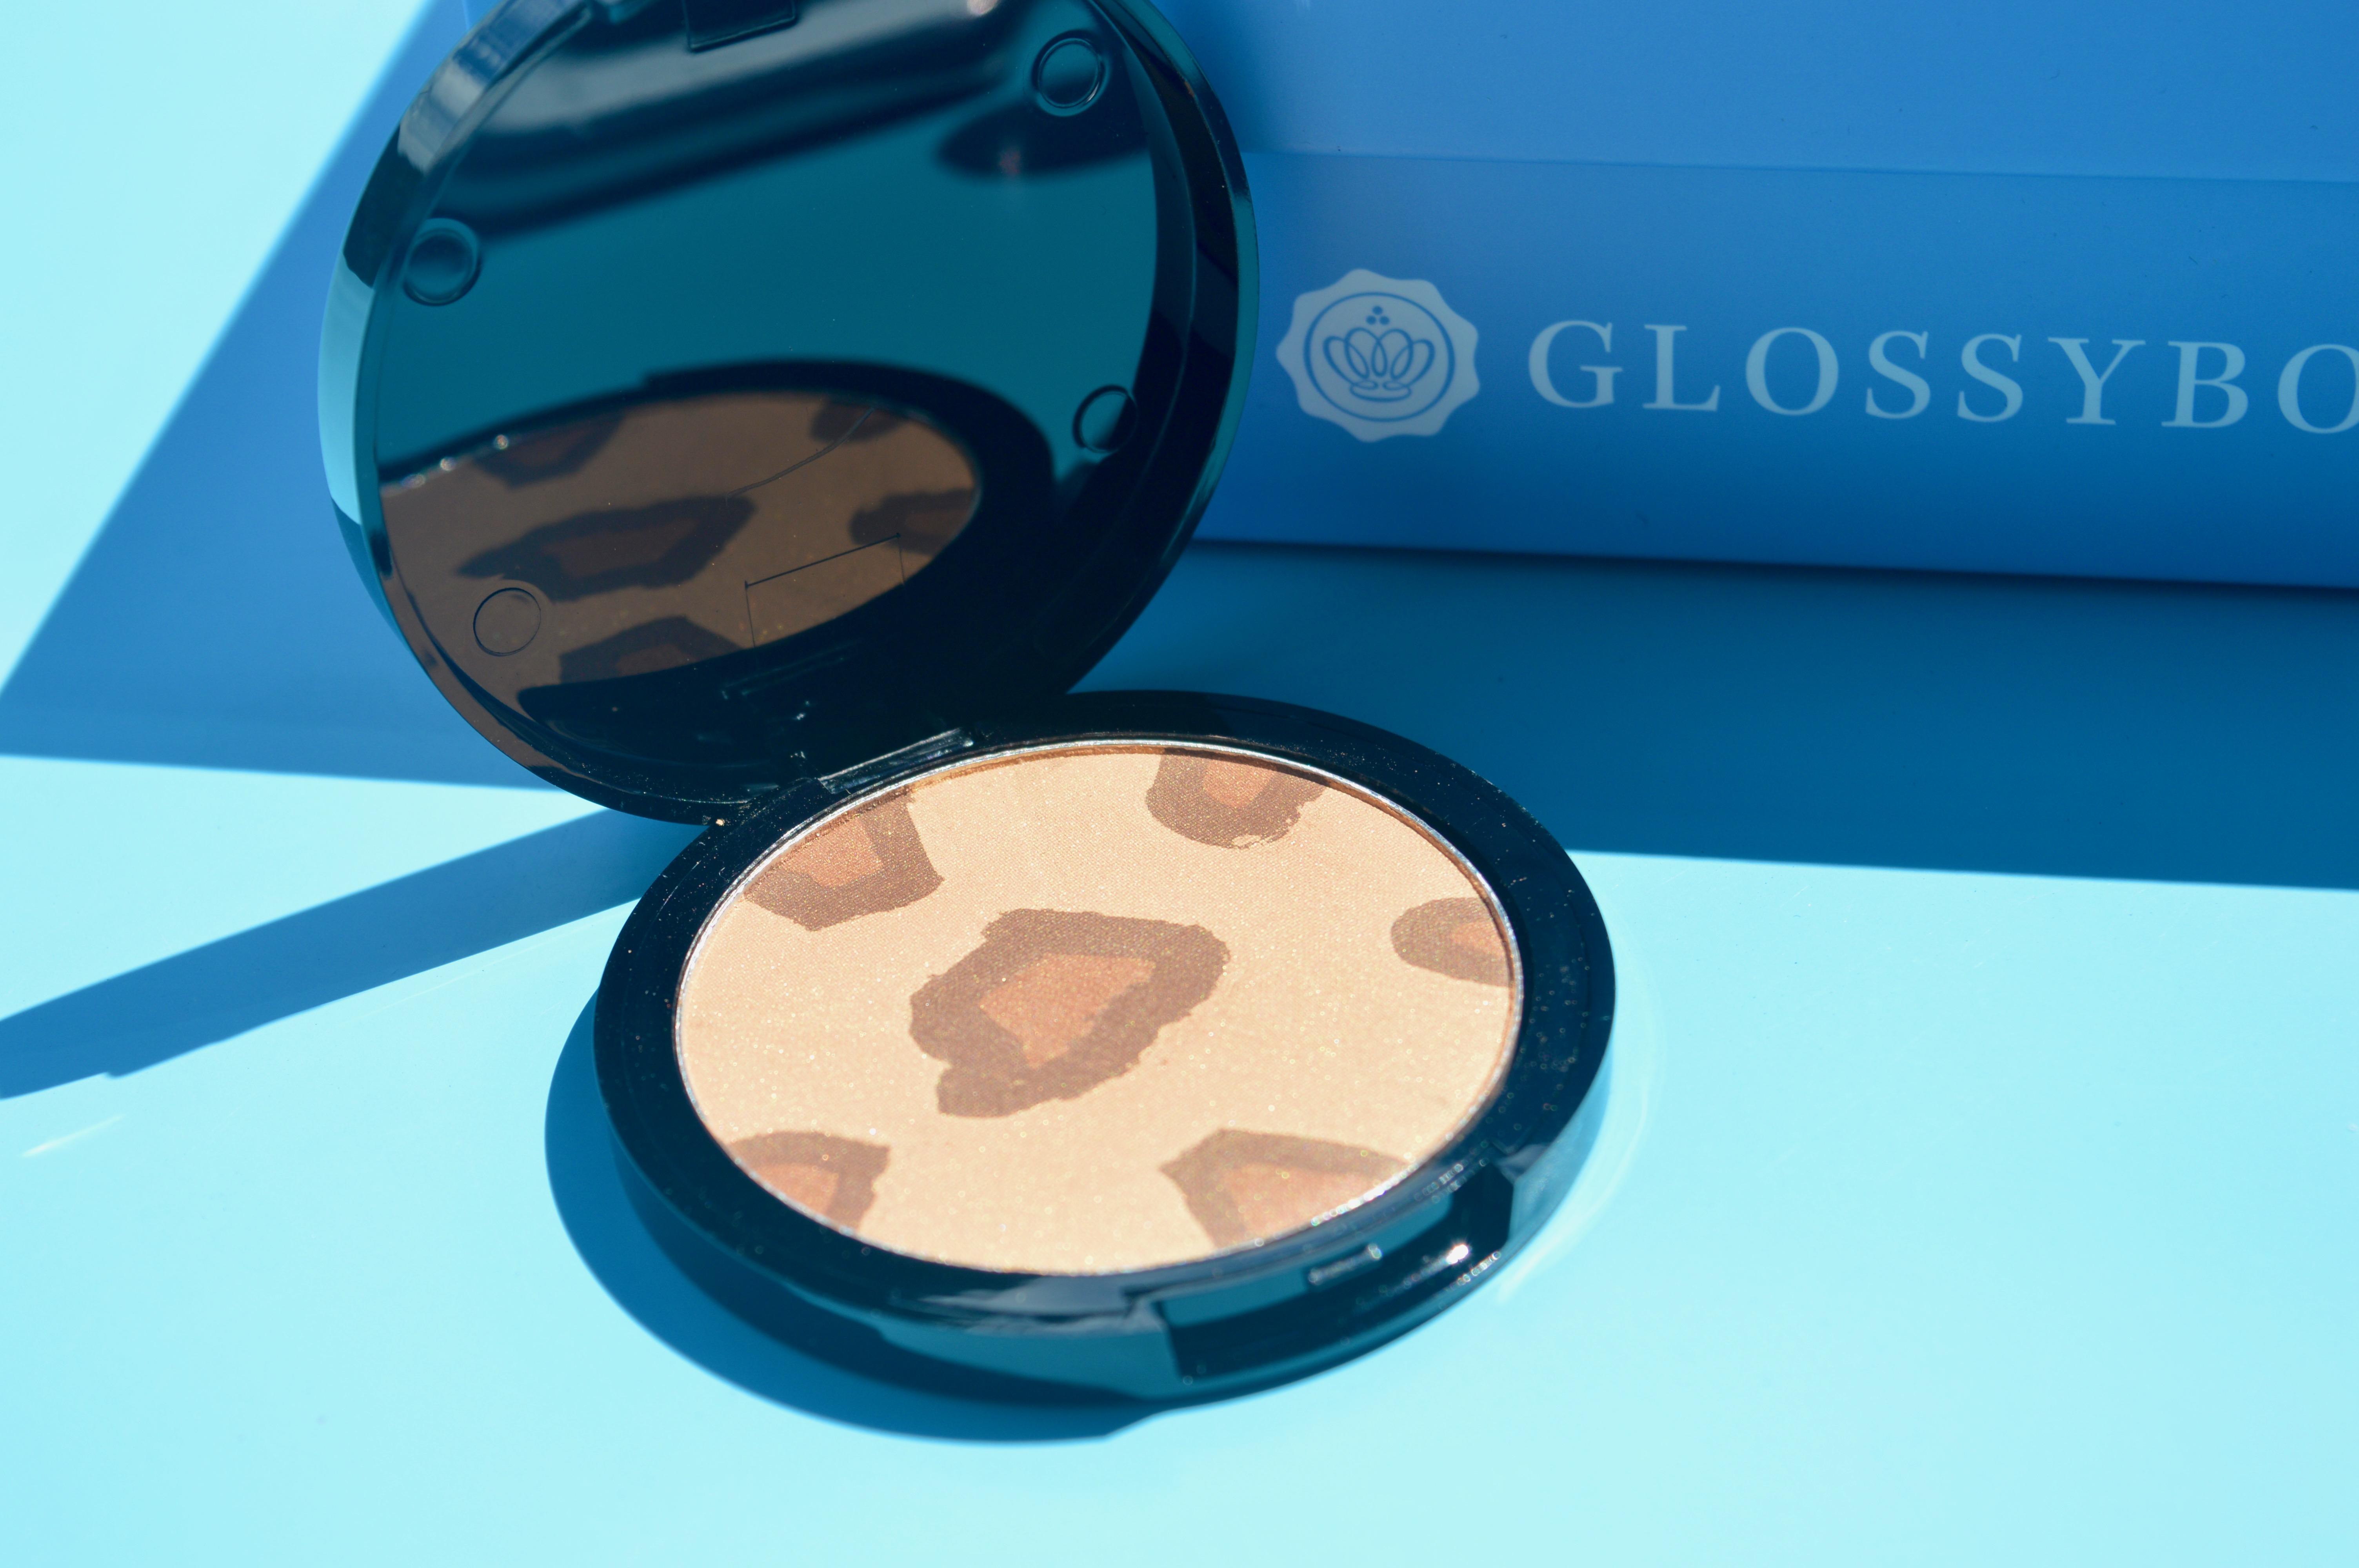 Safari-Bronzer-Subscription-Boxes-August-Collectors-Glossybox-Elle-Blonde-Luxury-Lifestyle-Destination